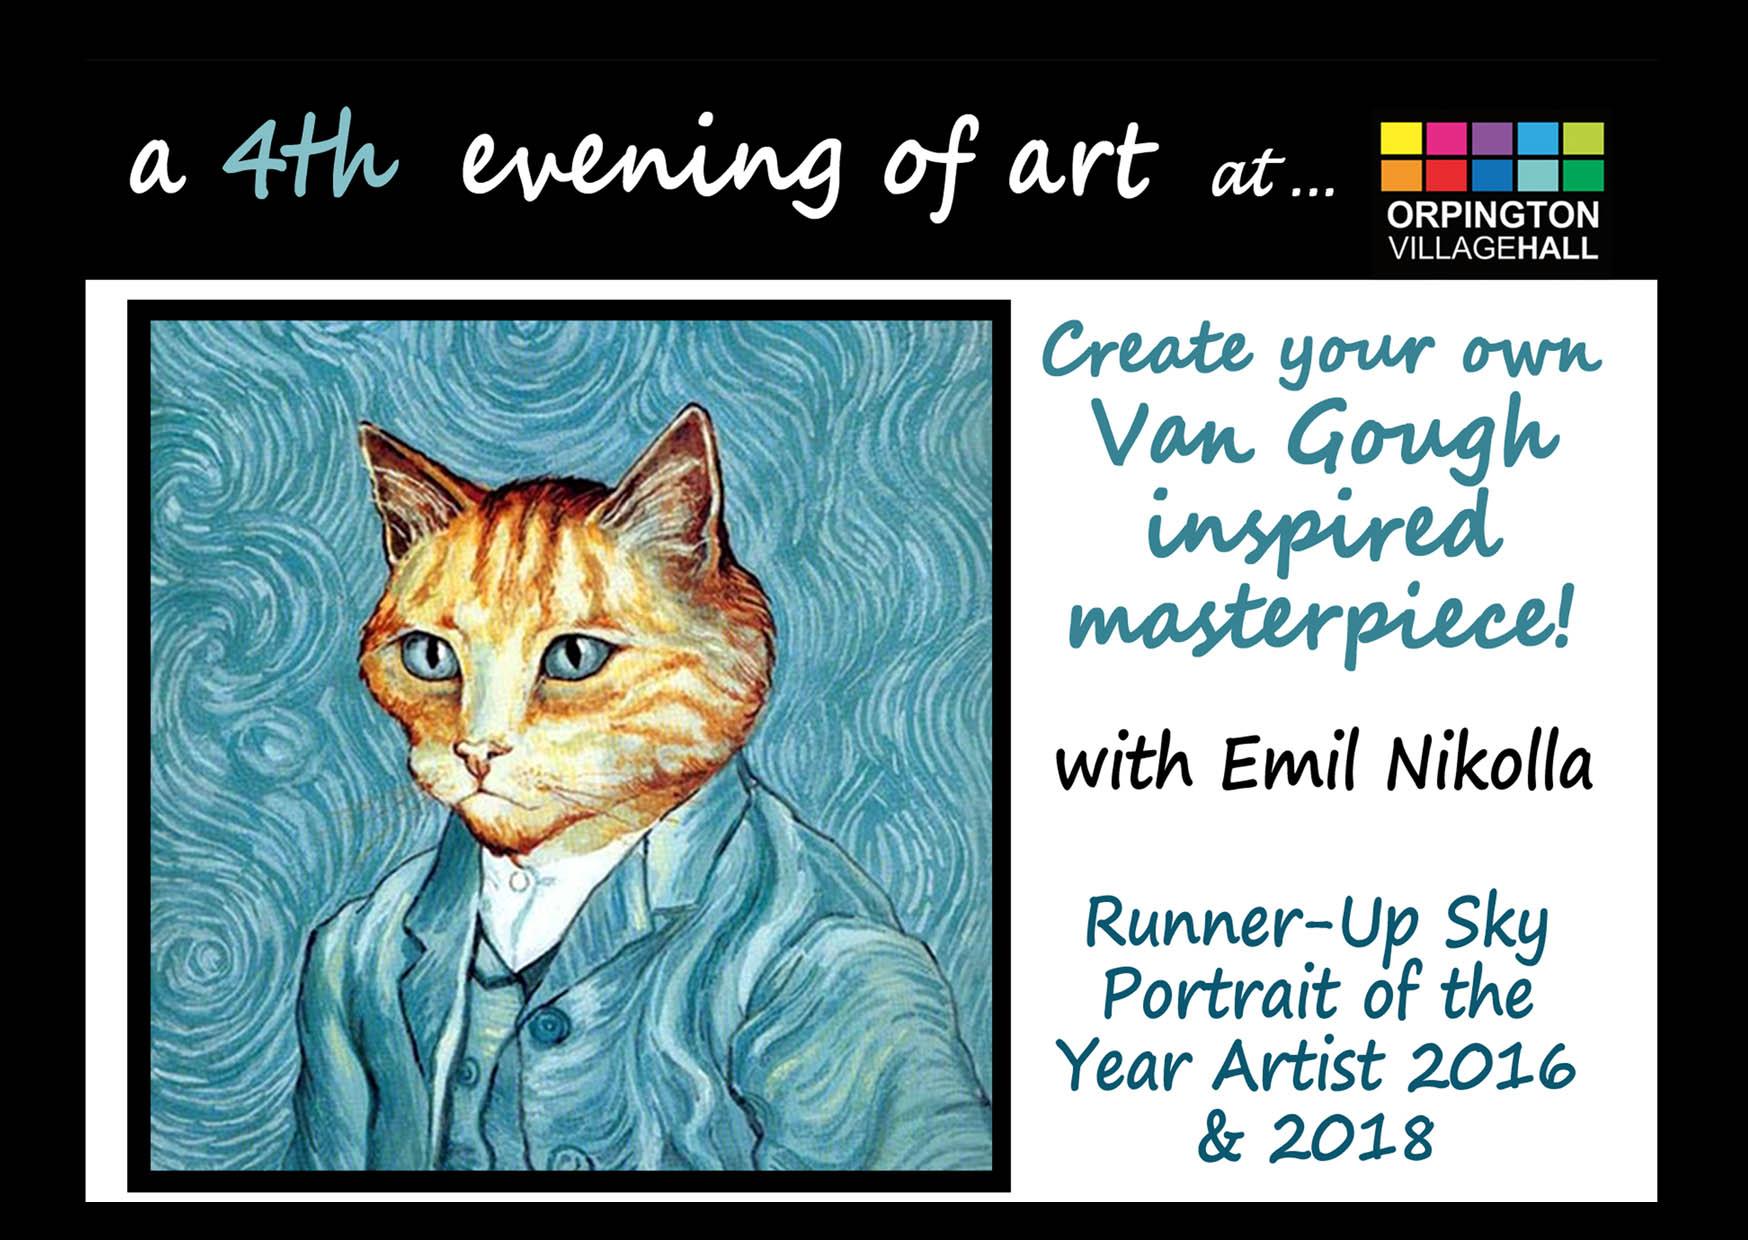 4th Evening of Art image